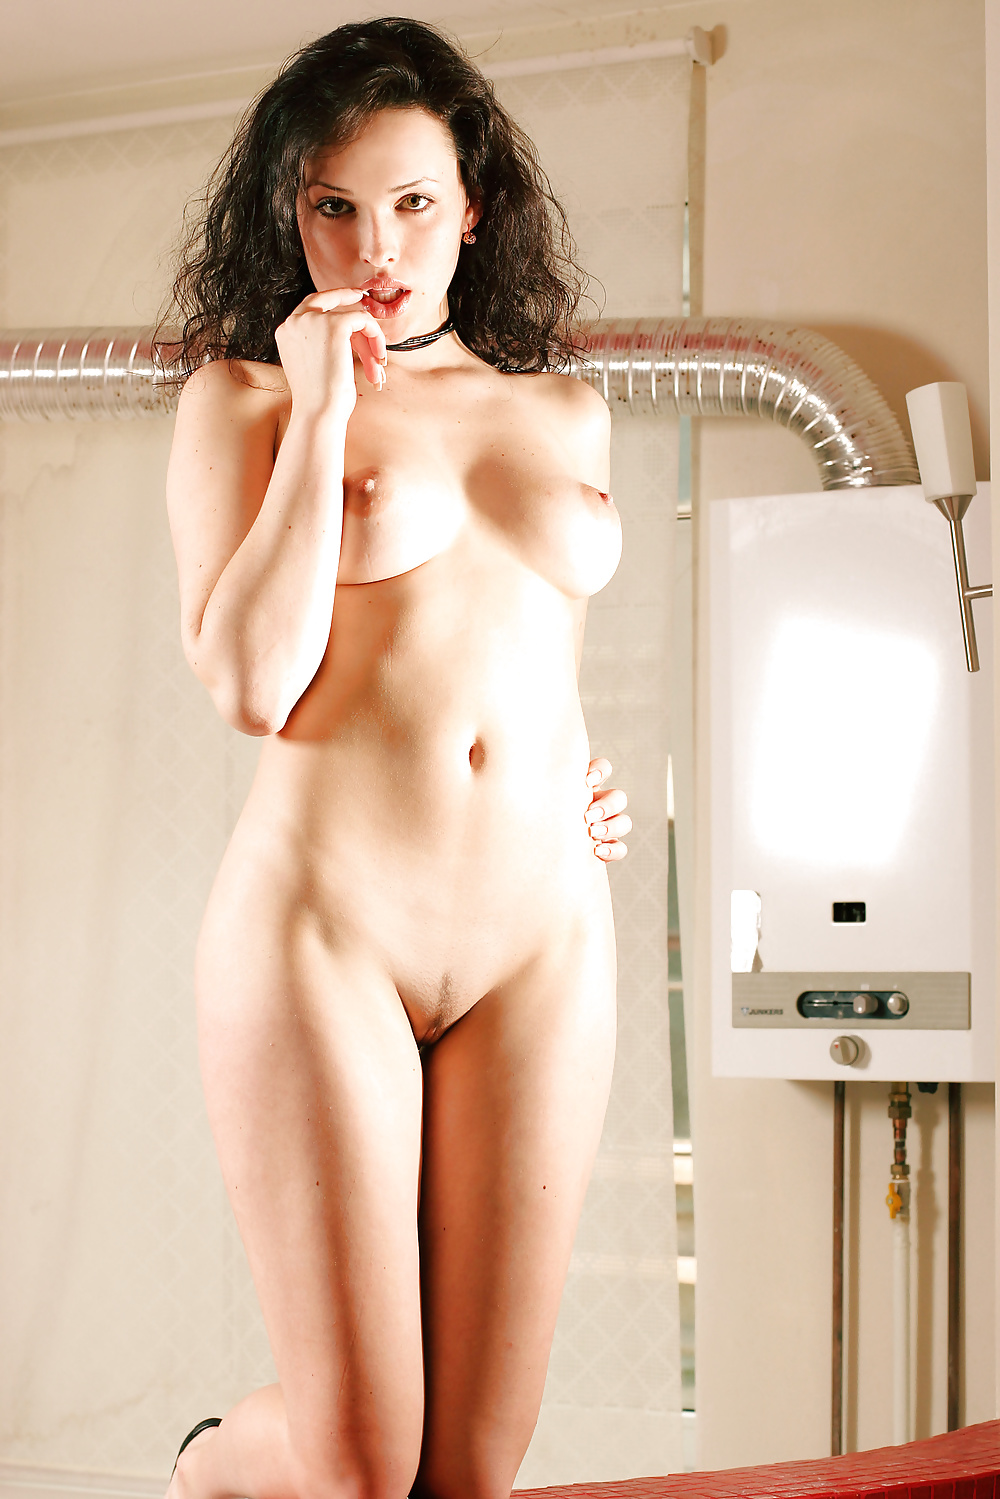 Dasha astafieva perfect tits